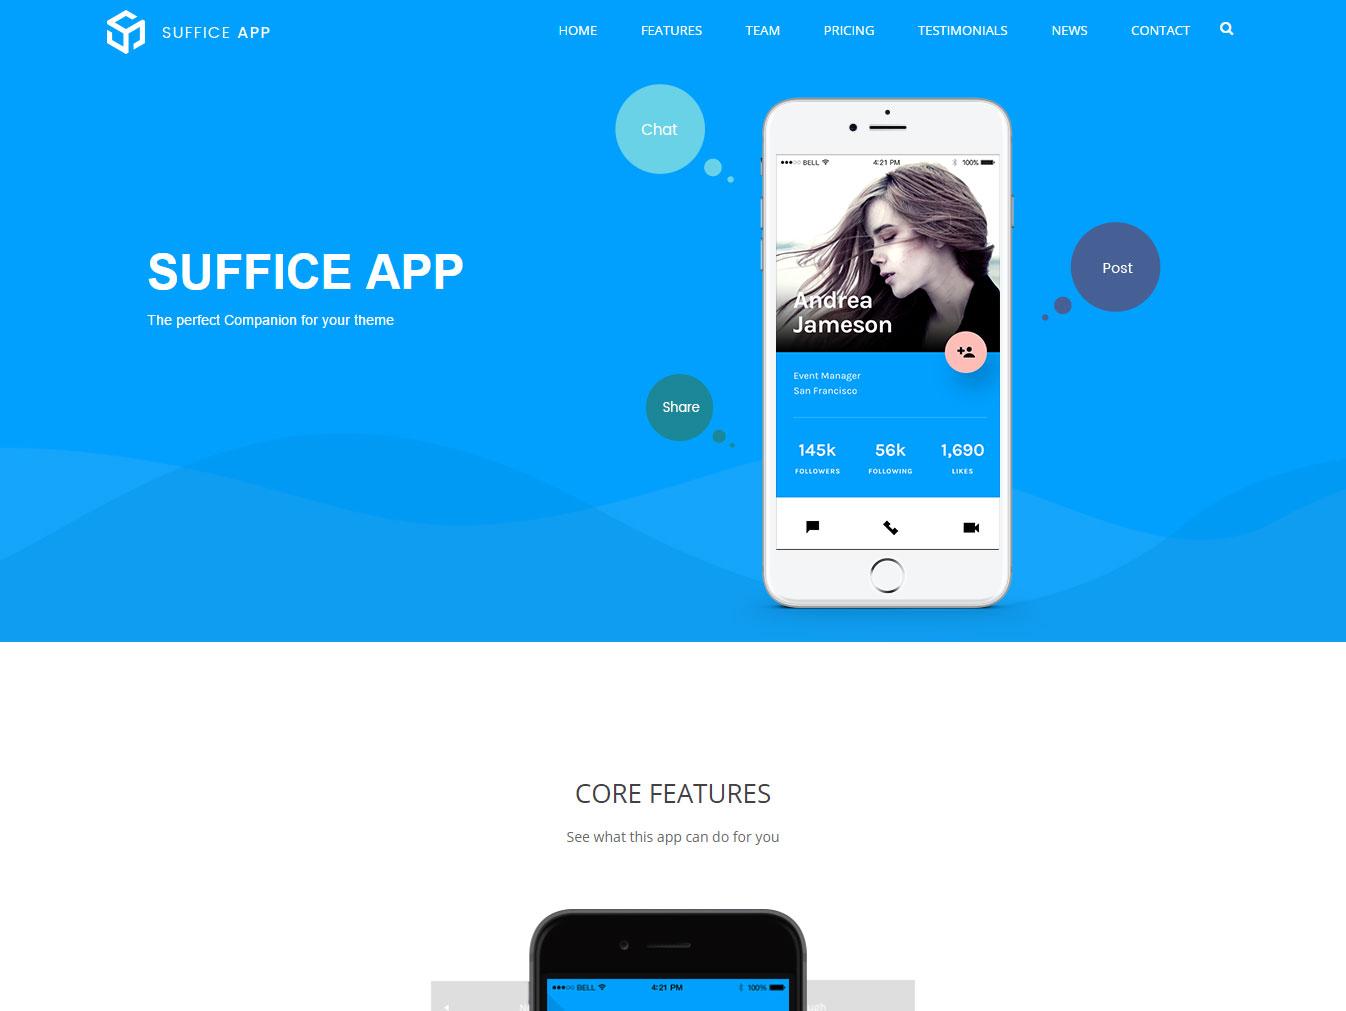 suffice-pro-app